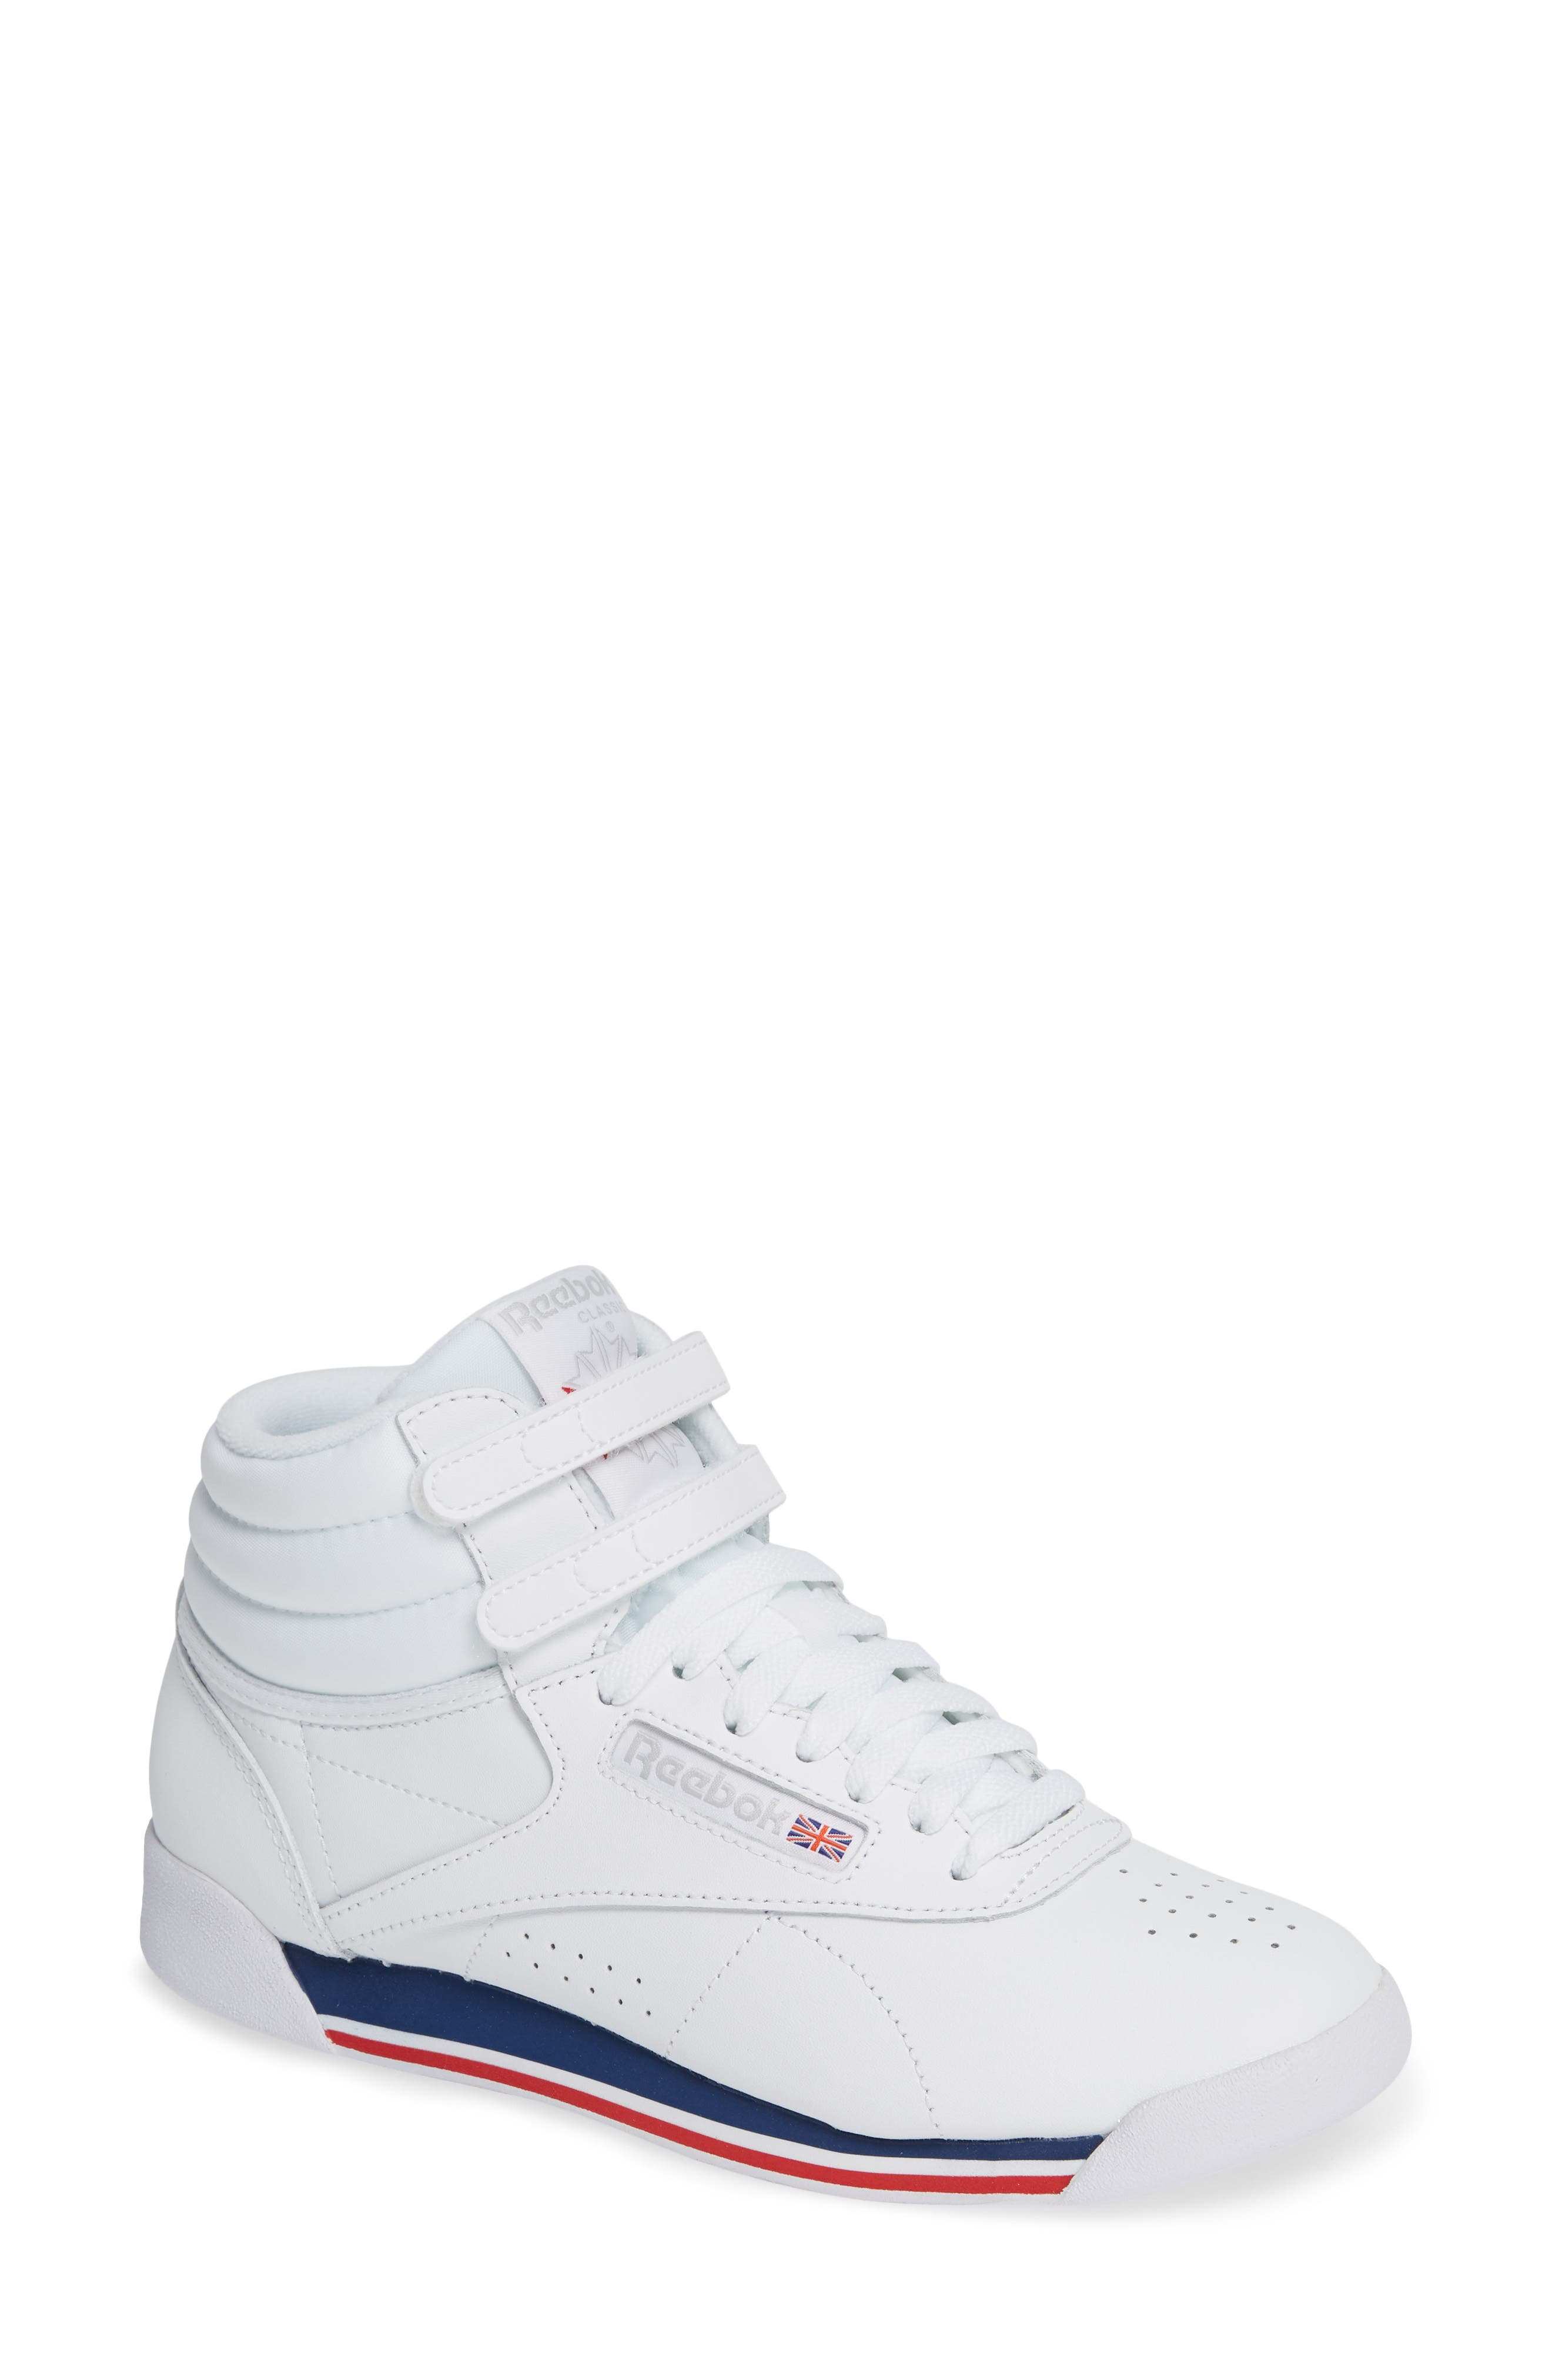 Freestyle Hi Sneaker,                             Main thumbnail 1, color,                             101